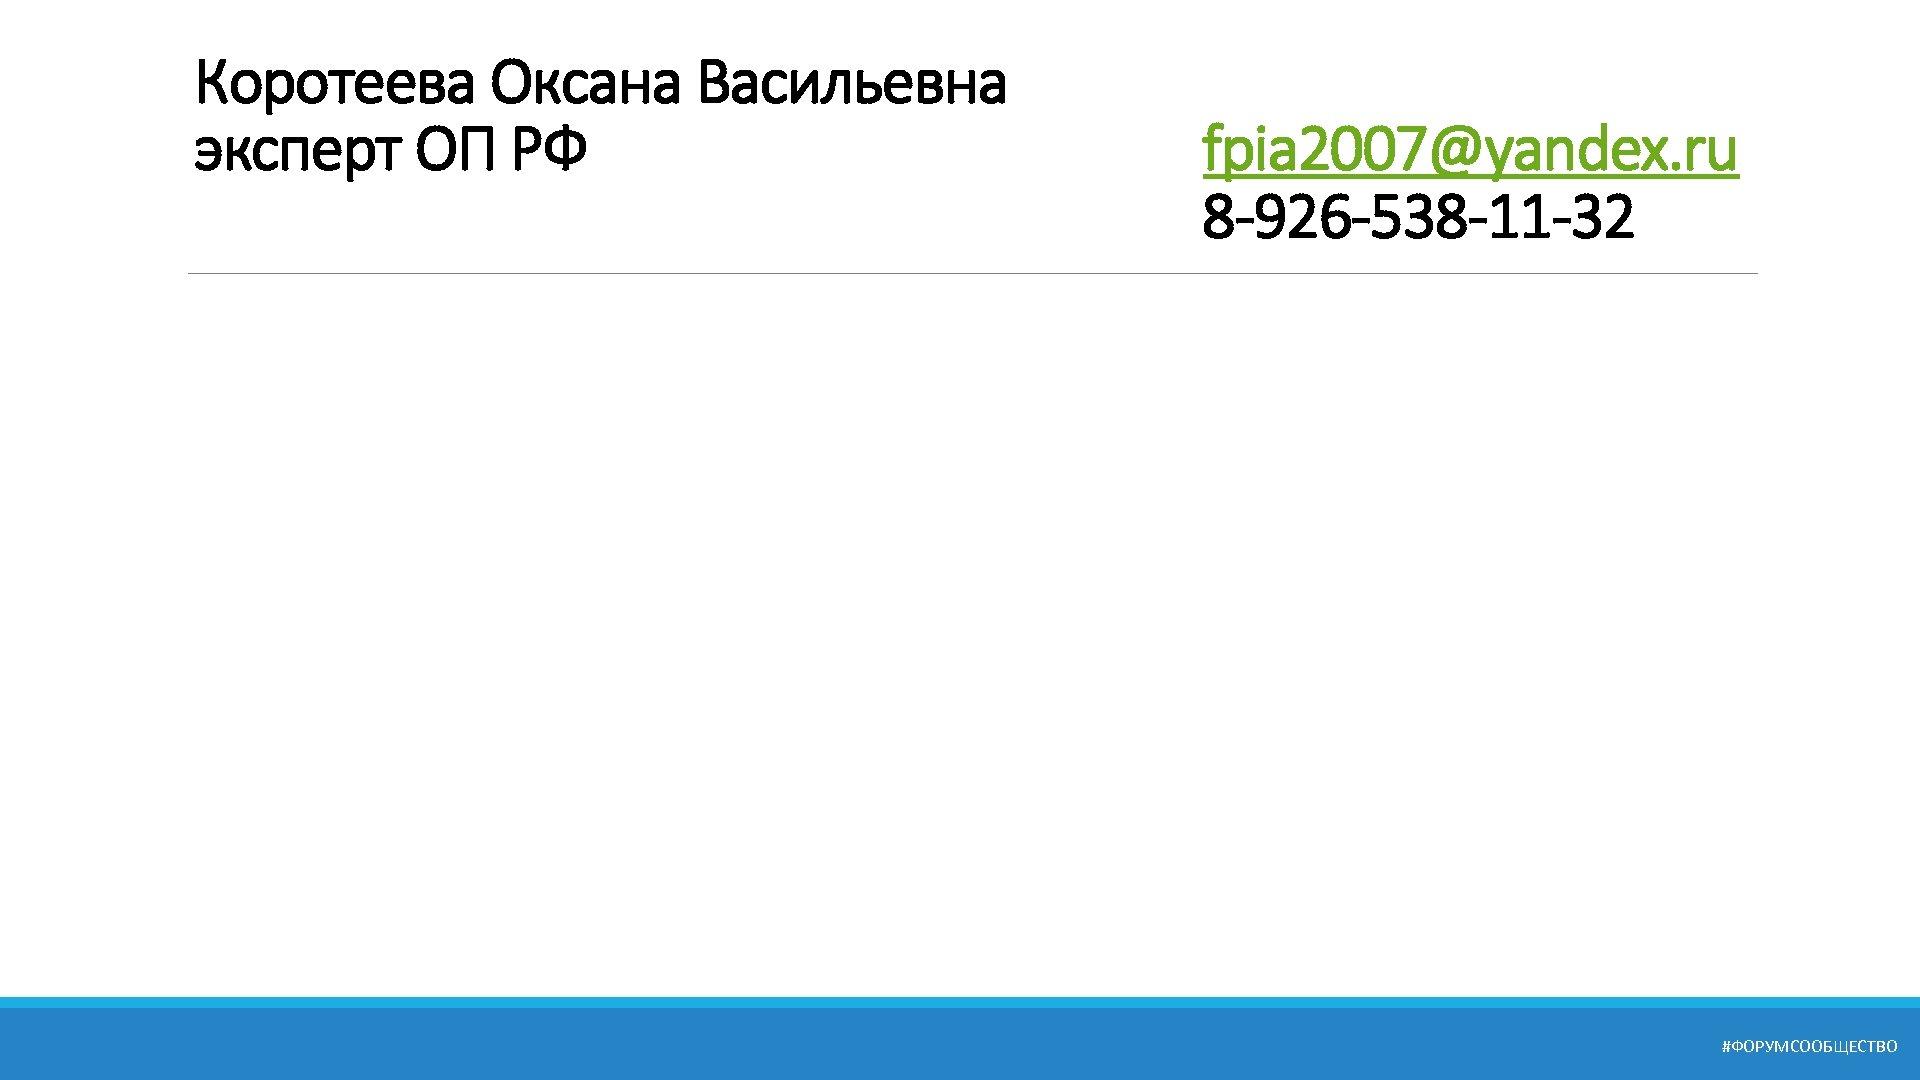 Коротеева Оксана Васильевна эксперт ОП РФ fpia 2007@yandex. ru 8 -926 -538 -11 -32